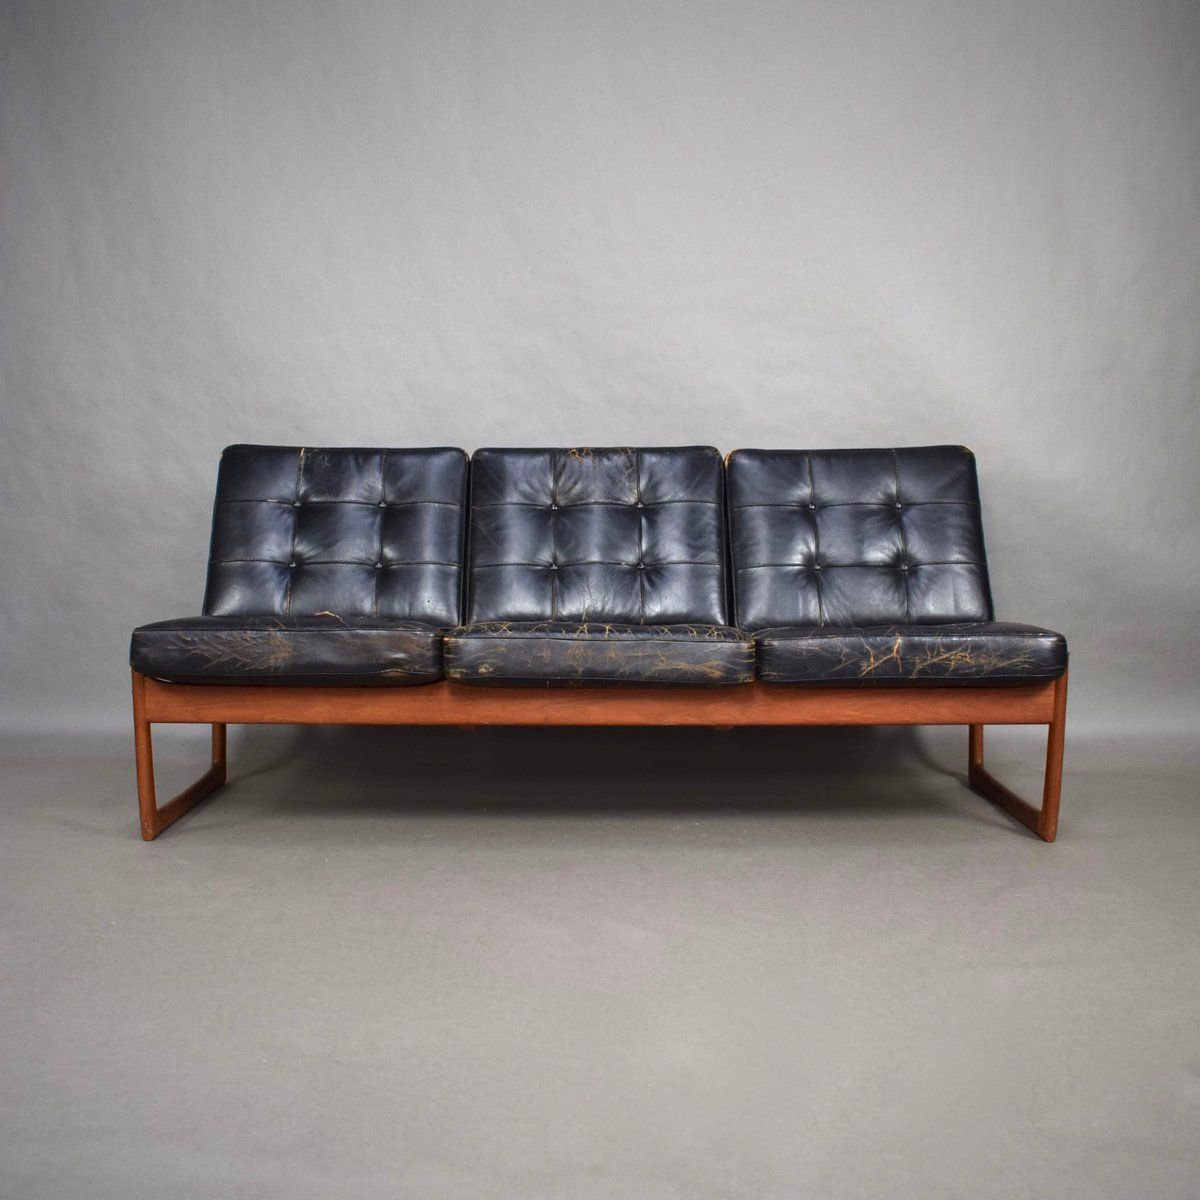 66e5355aef0a0 Model FD130 Sofa by Peter Hvidt and Orla Mølgaard-Nielsen for France   Søn